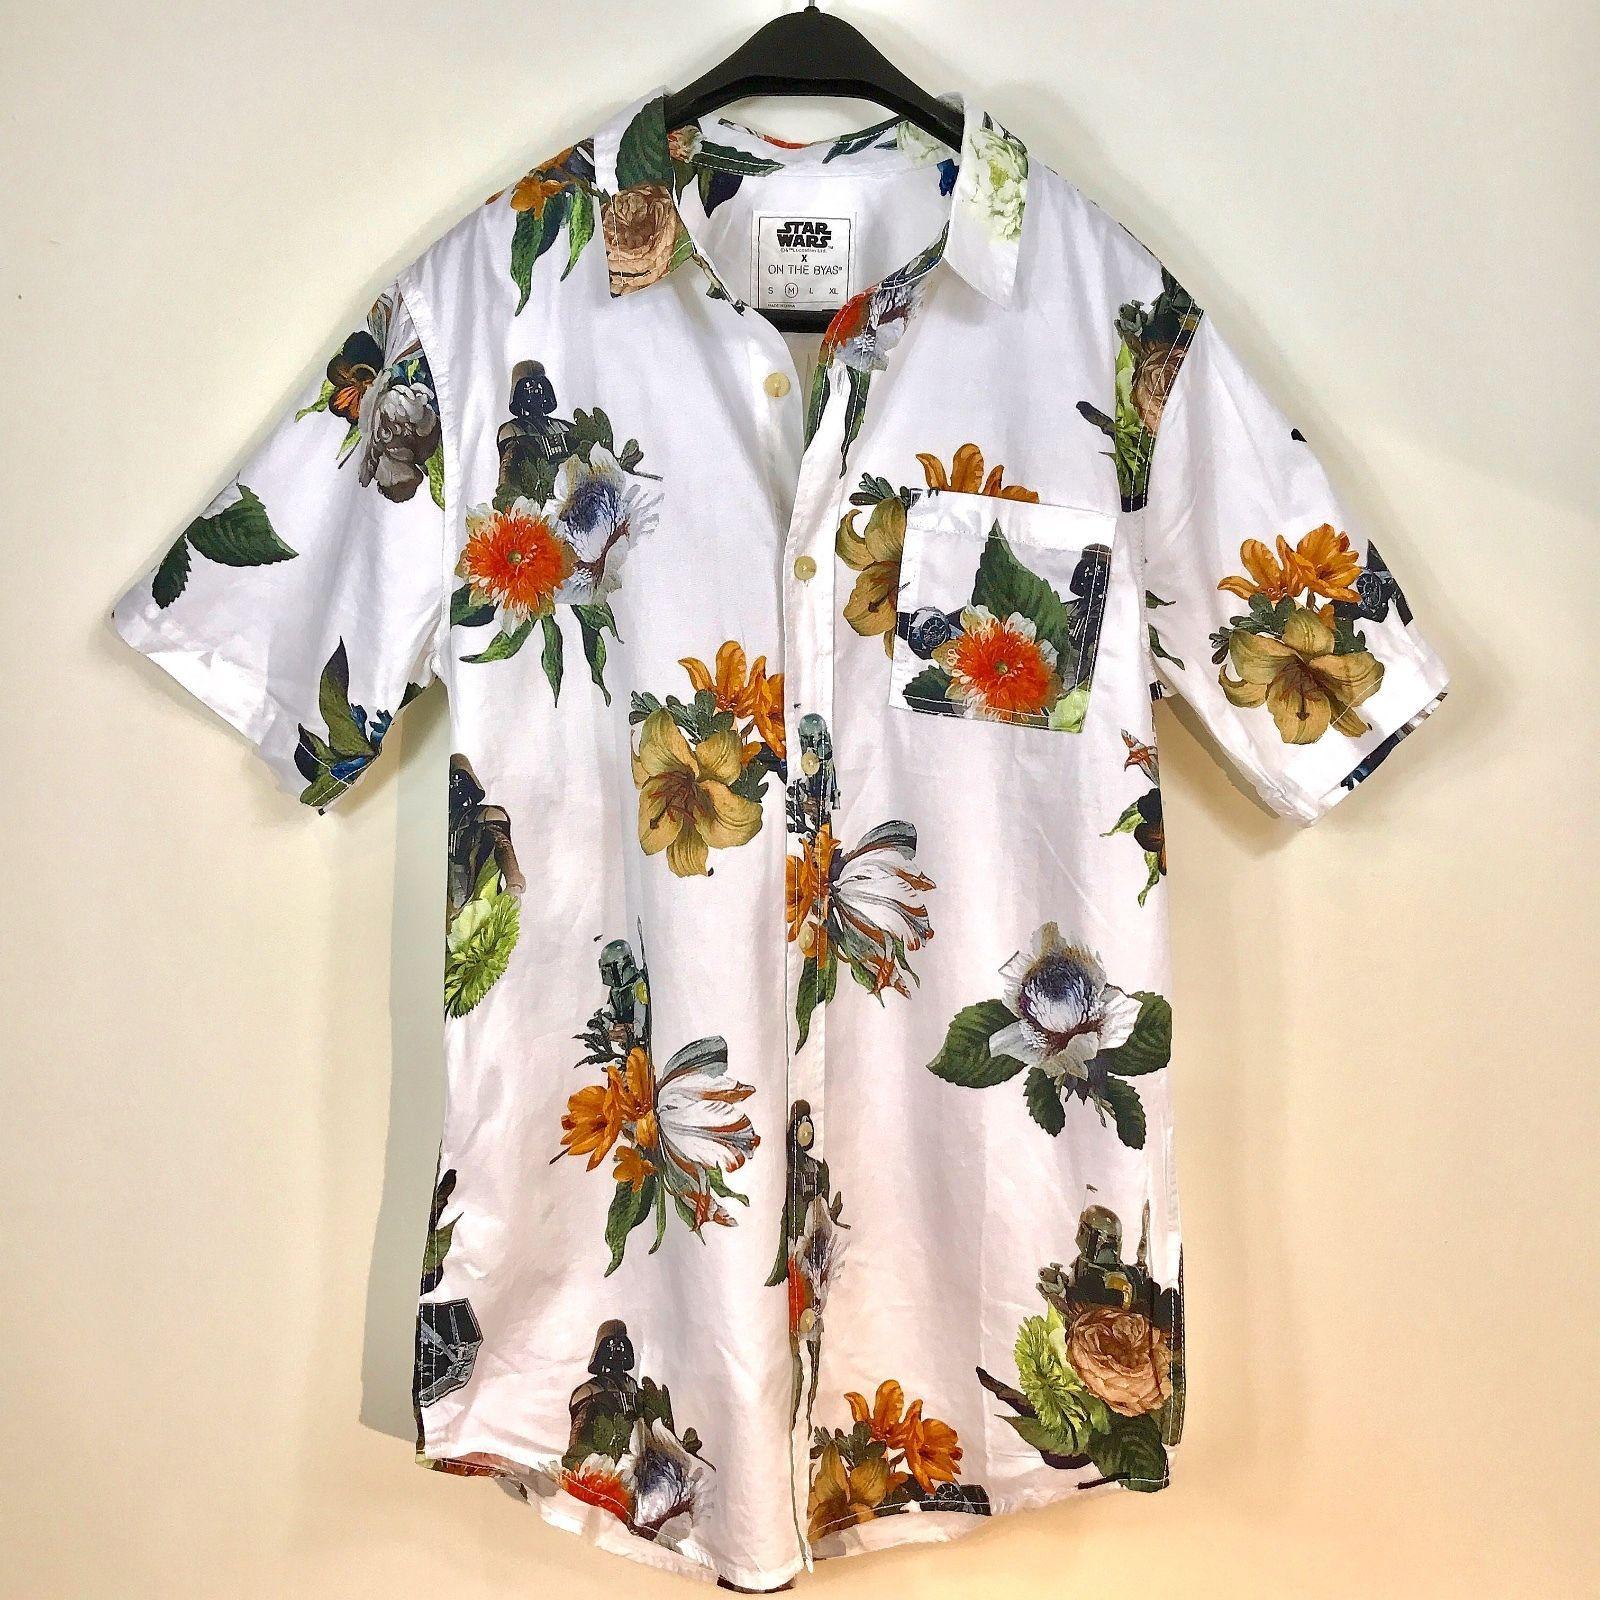 c8b26e5307 Men s ON THE BYAS STAR WARS Darth Vader Hawaiian Flora 100% Cotton Woven  Shirt